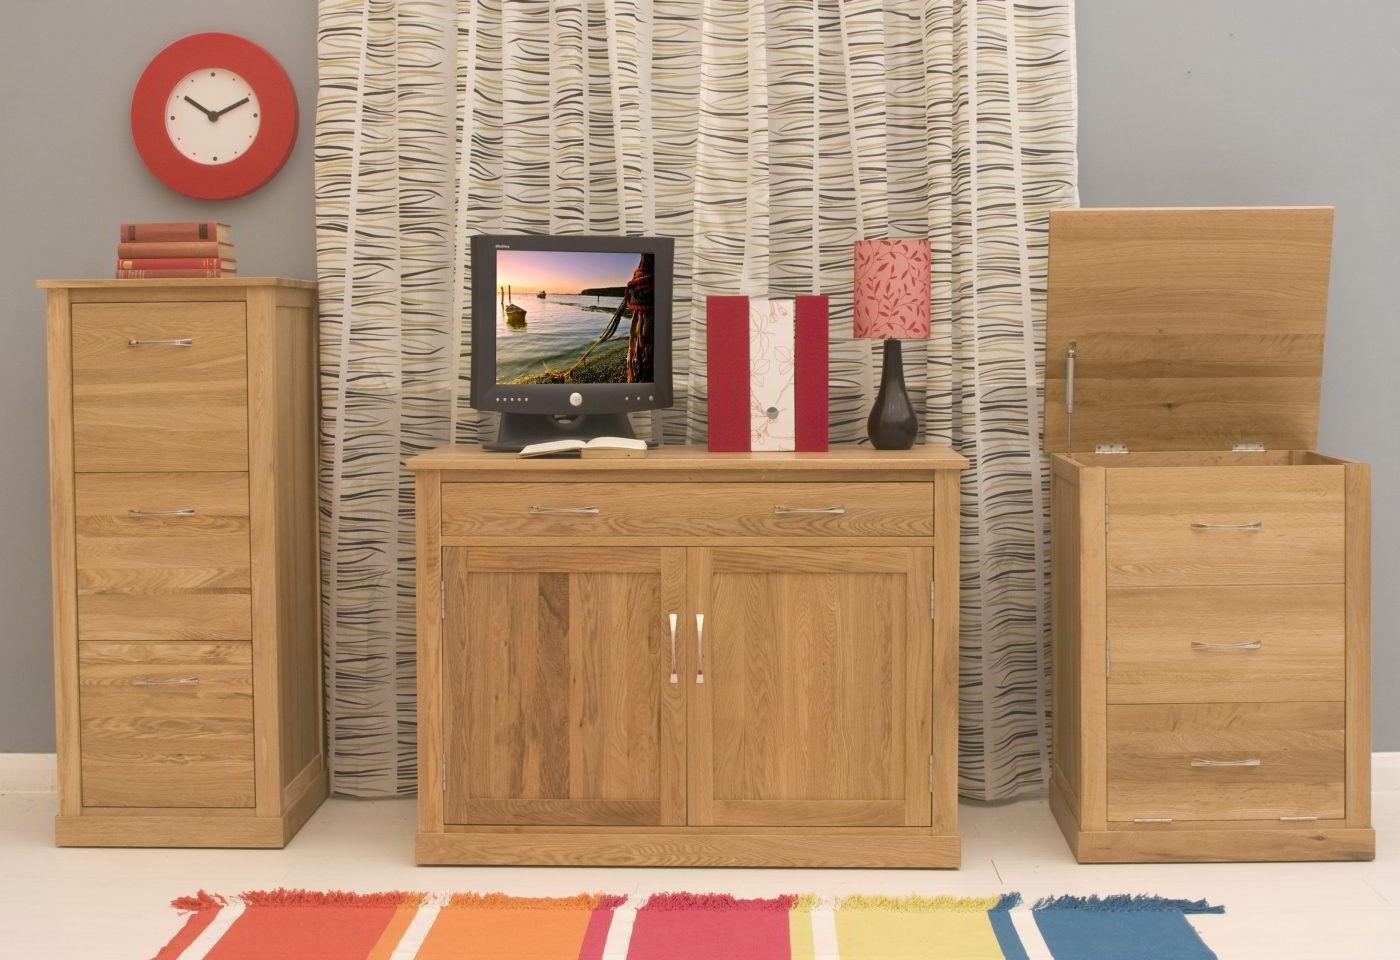 Conran solid oak hidden home office Office Desk Conran Solid Oak Modern Furniture Hidden Home Office Hideaway Computer Pc Desk Ebay Conran Solid Oak Modern Furniture Hidden Home Office Hideaway